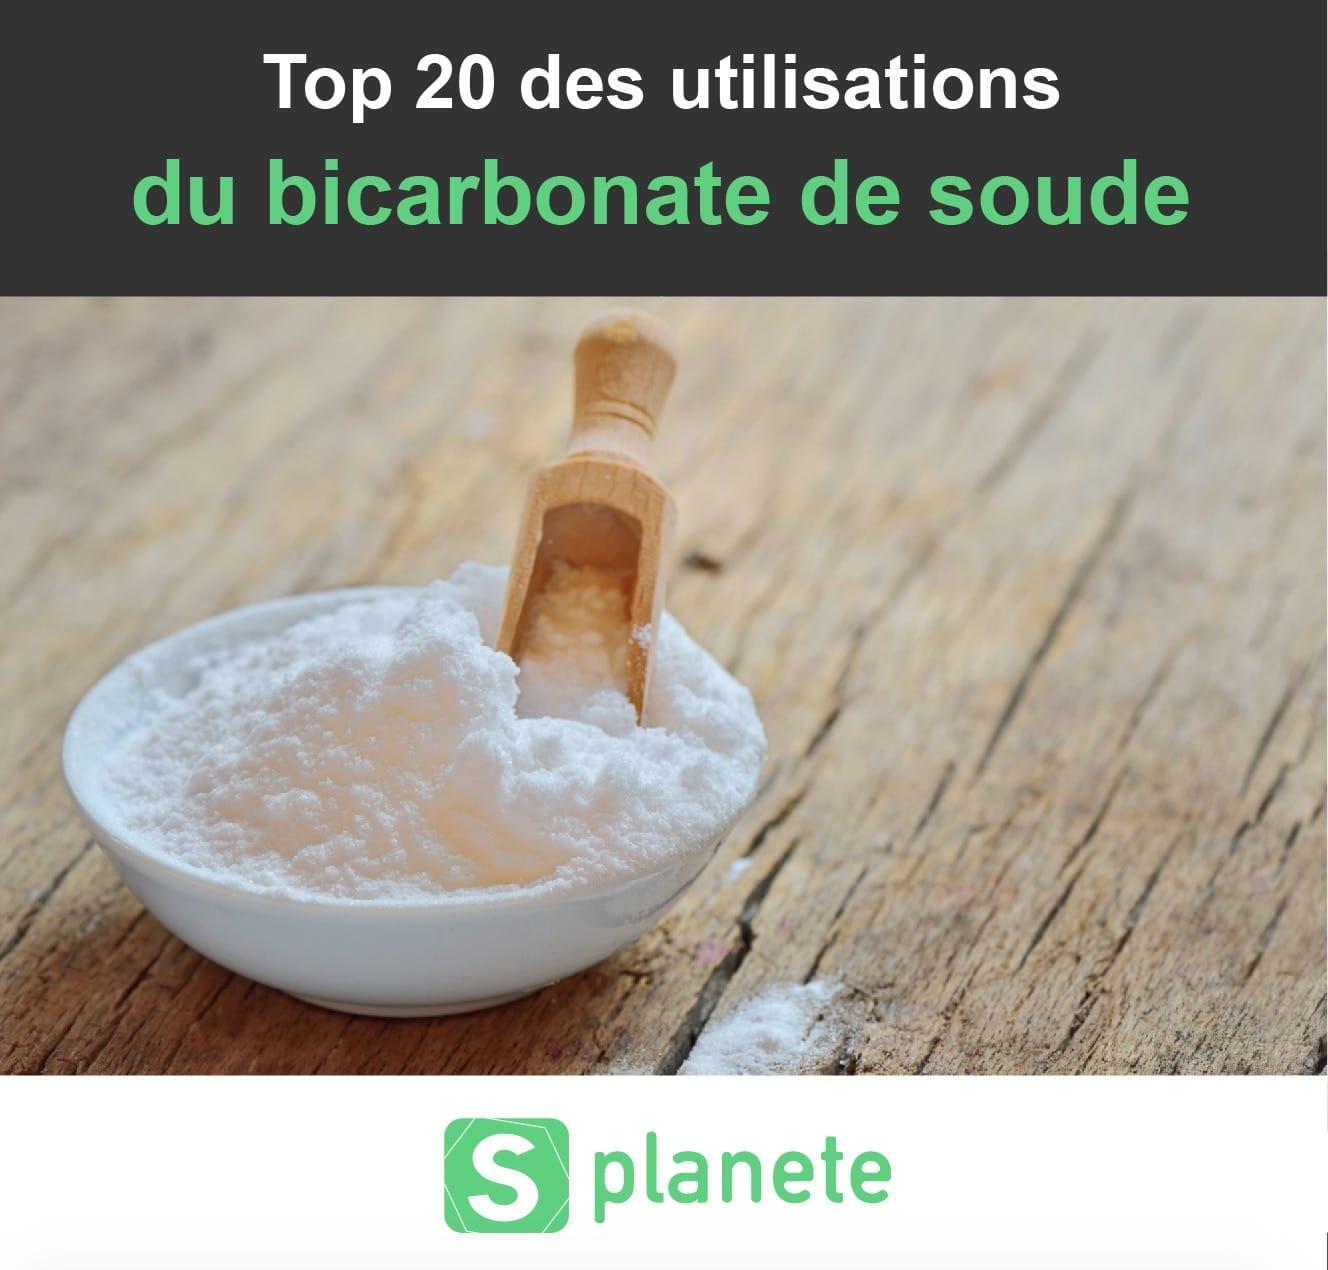 top 20 des utilisations du bicarbonate de soude plan te. Black Bedroom Furniture Sets. Home Design Ideas